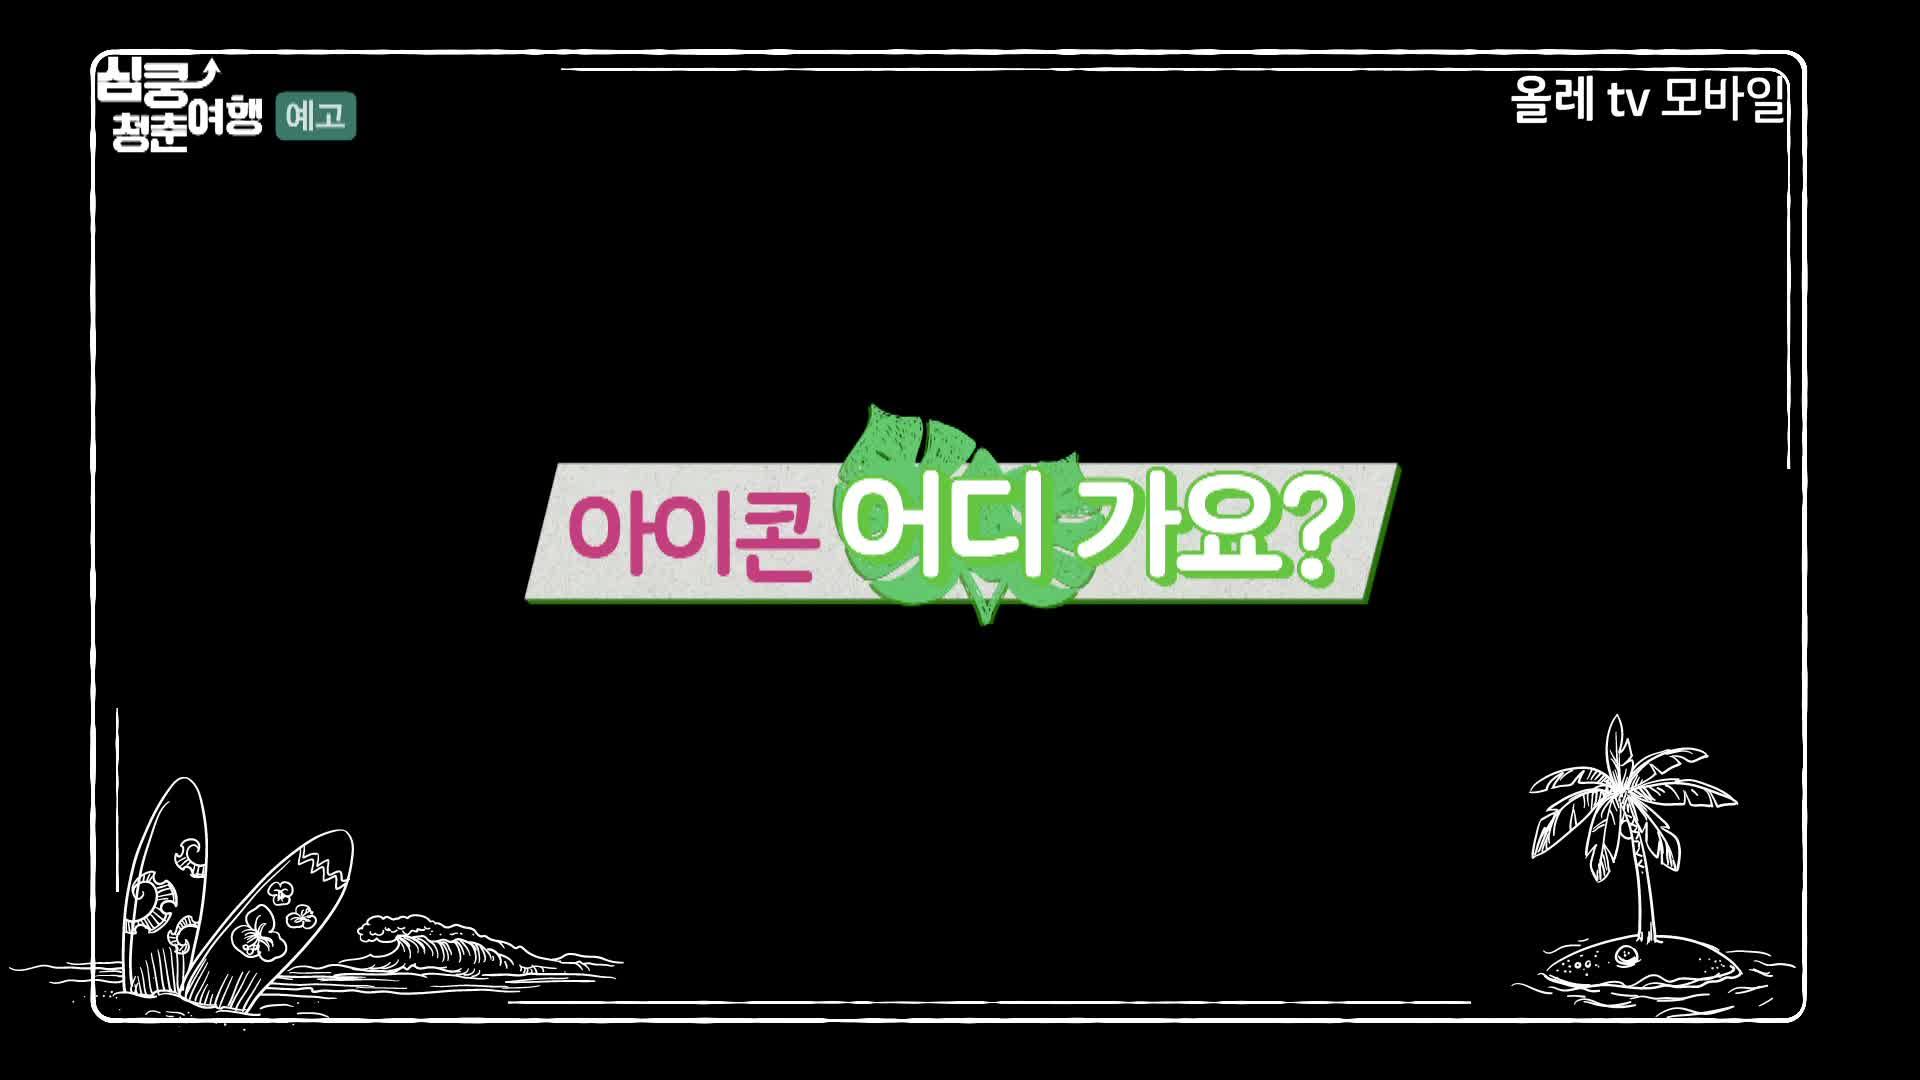 iKON - 'iKON 심쿵 청춘여행' 1화 예고